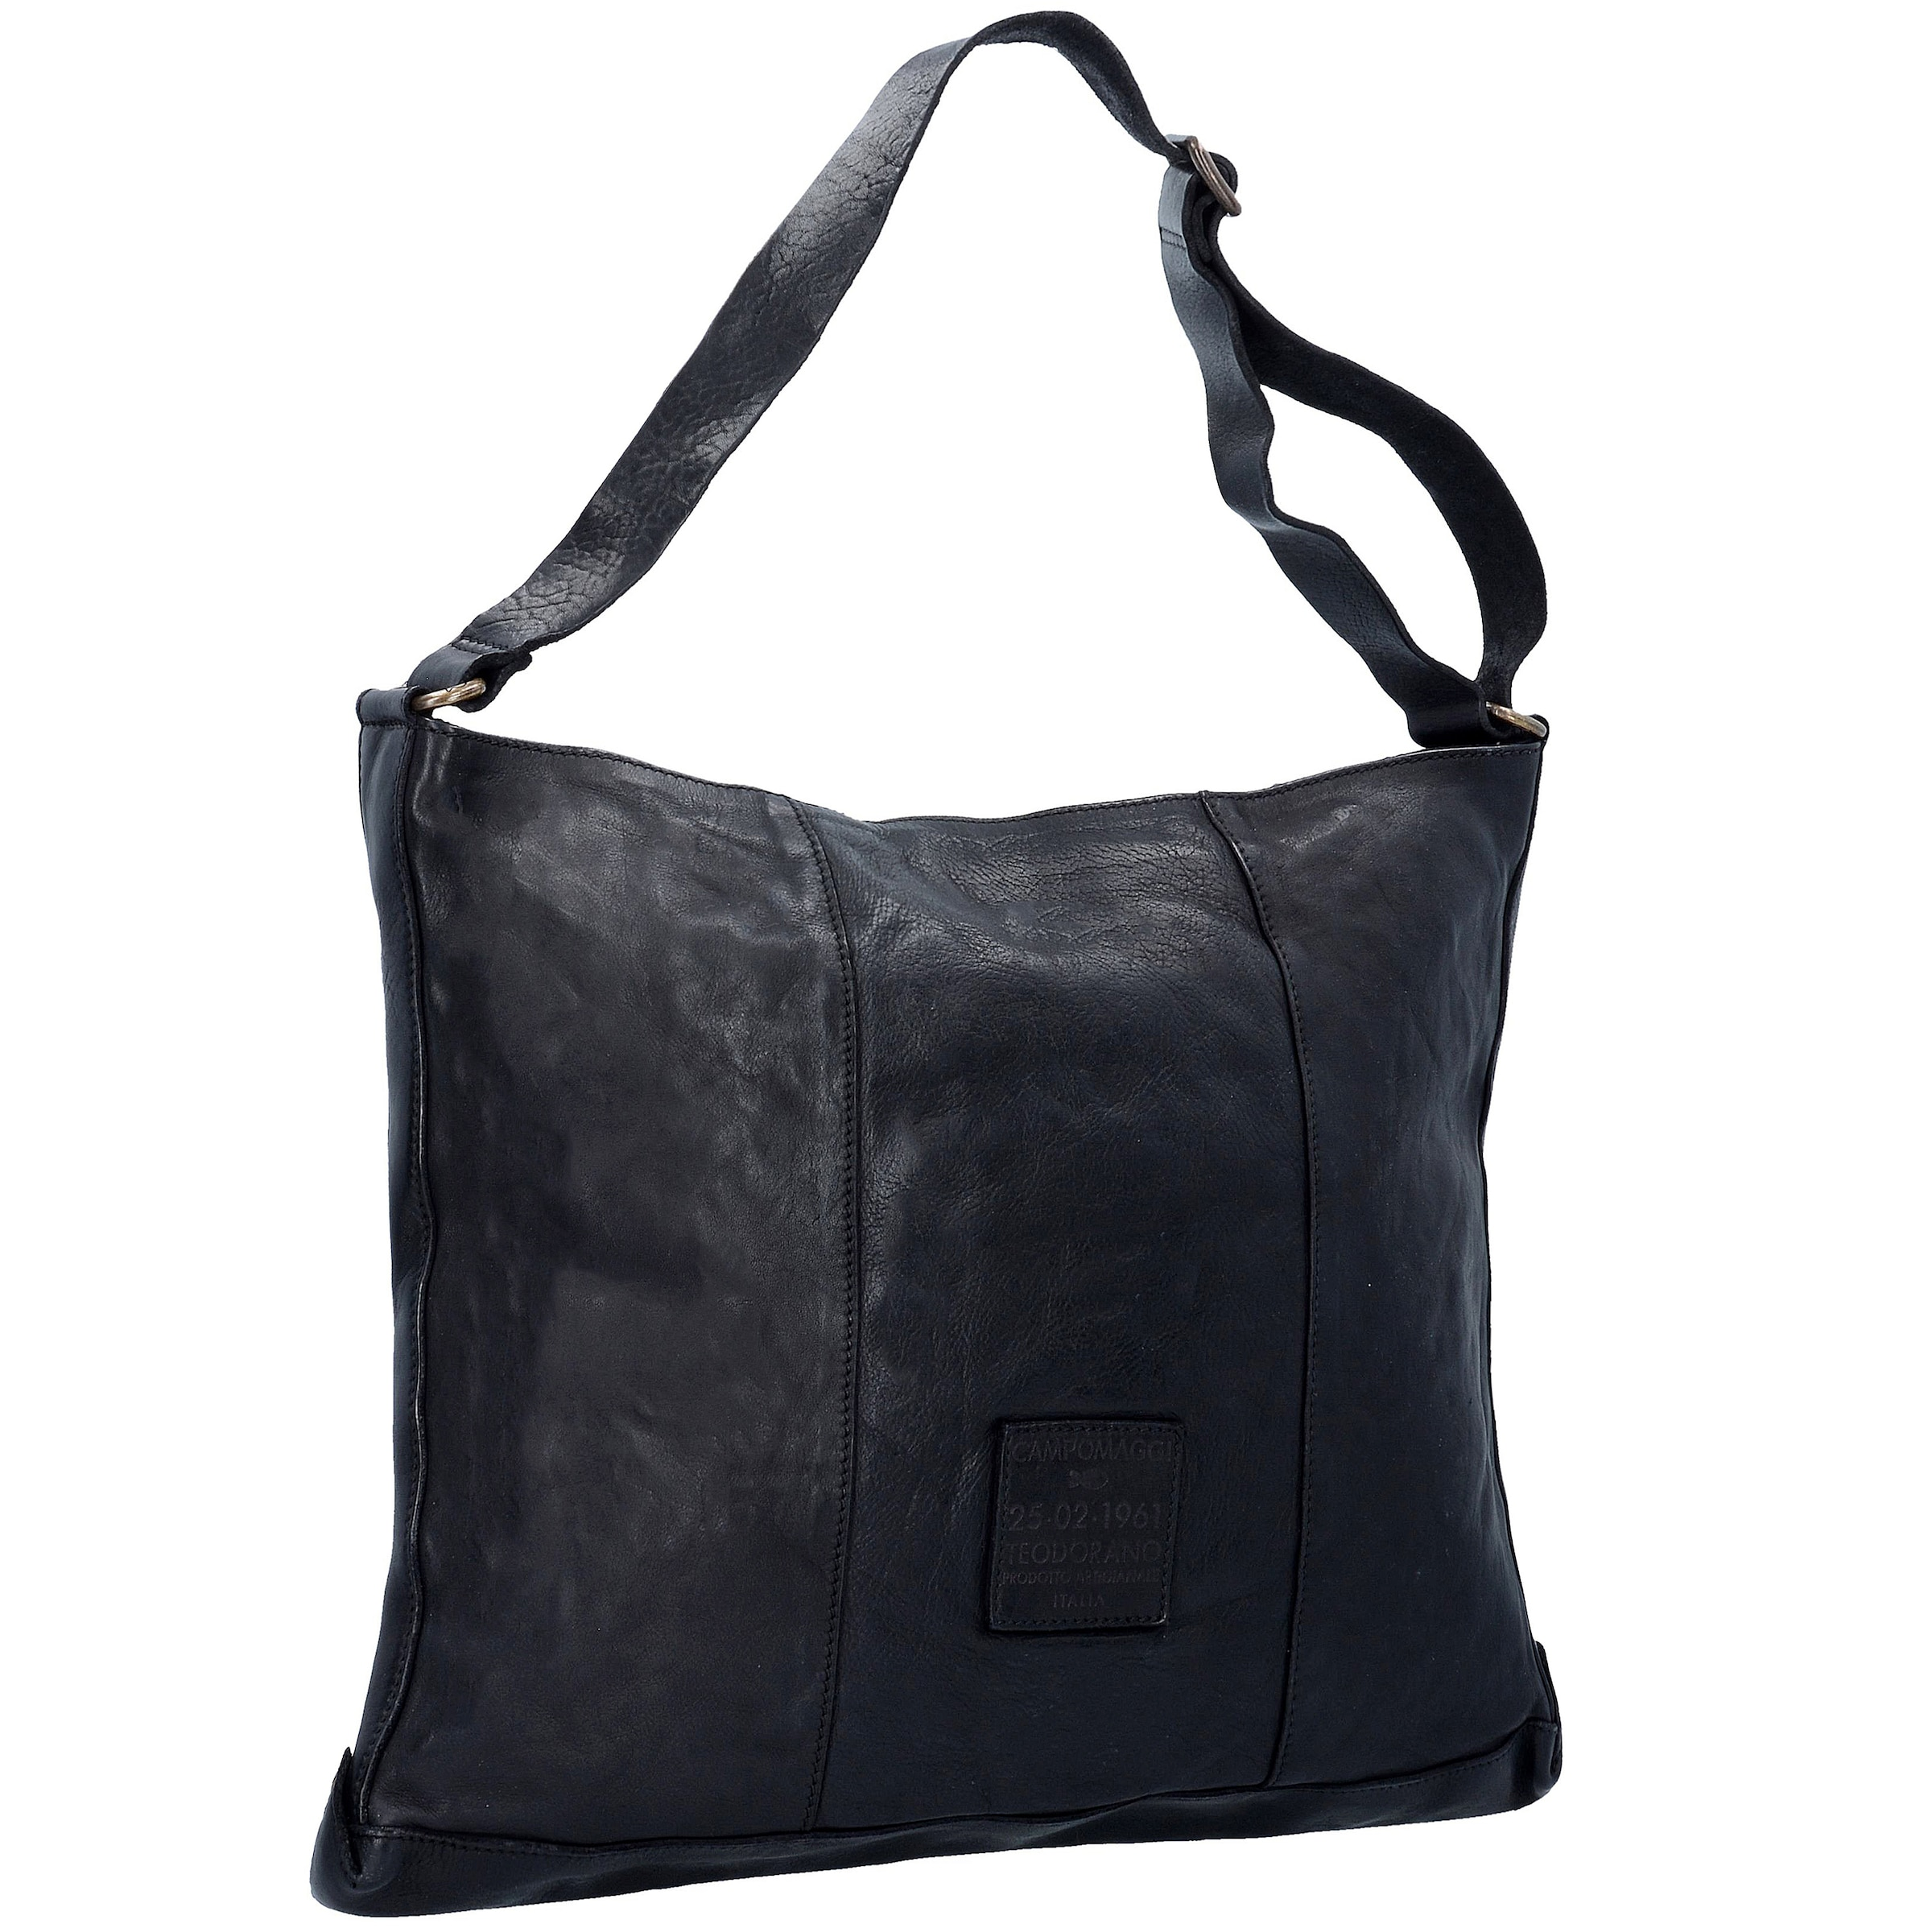 Edera Leder In Cm Tasche 45 Schwarz Prestige Shopper Campomaggi nvwOm0N8